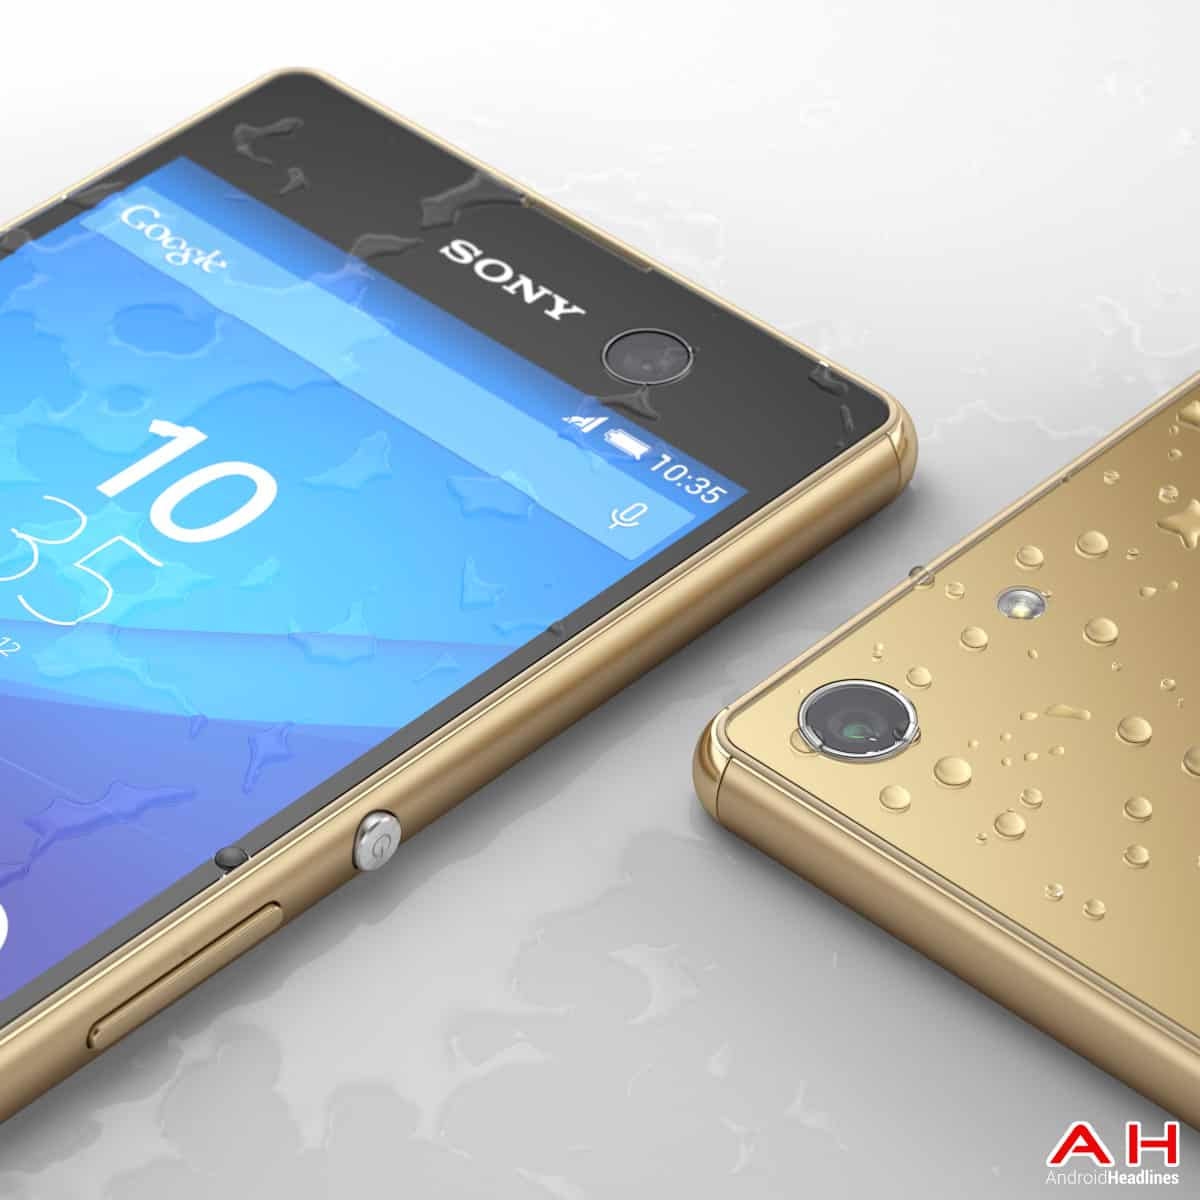 AH Sony Xperia M5 Press Images 8